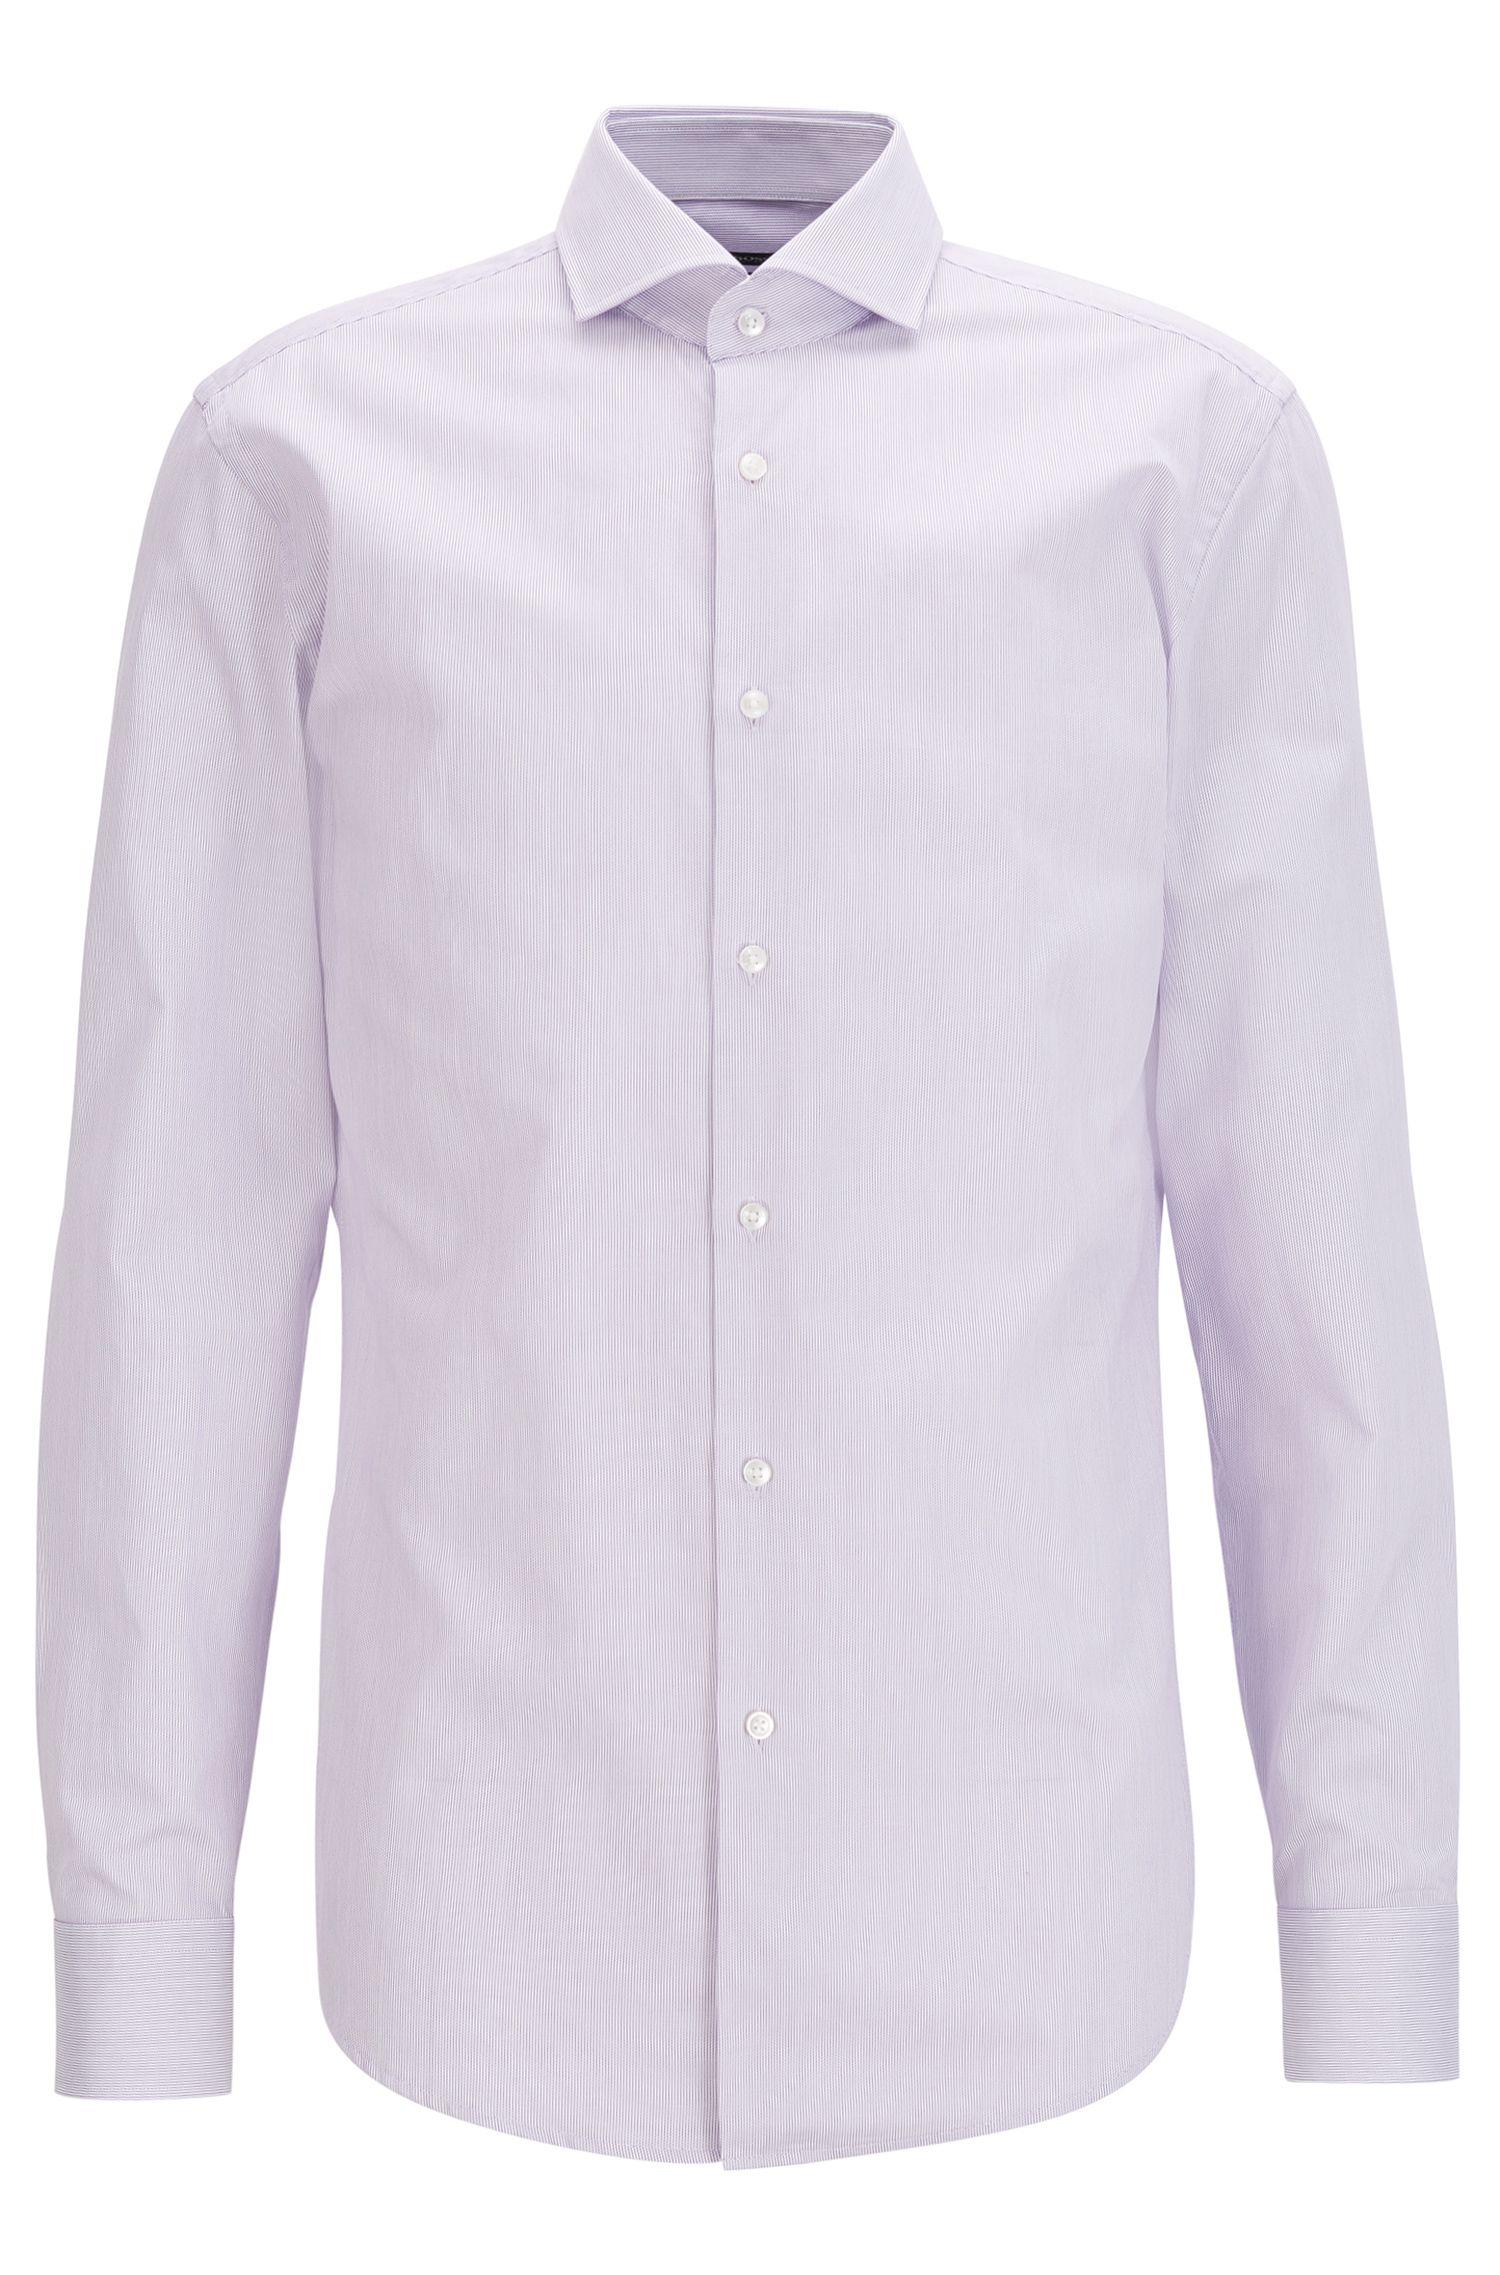 Slim-fit shirt in fine striped cotton